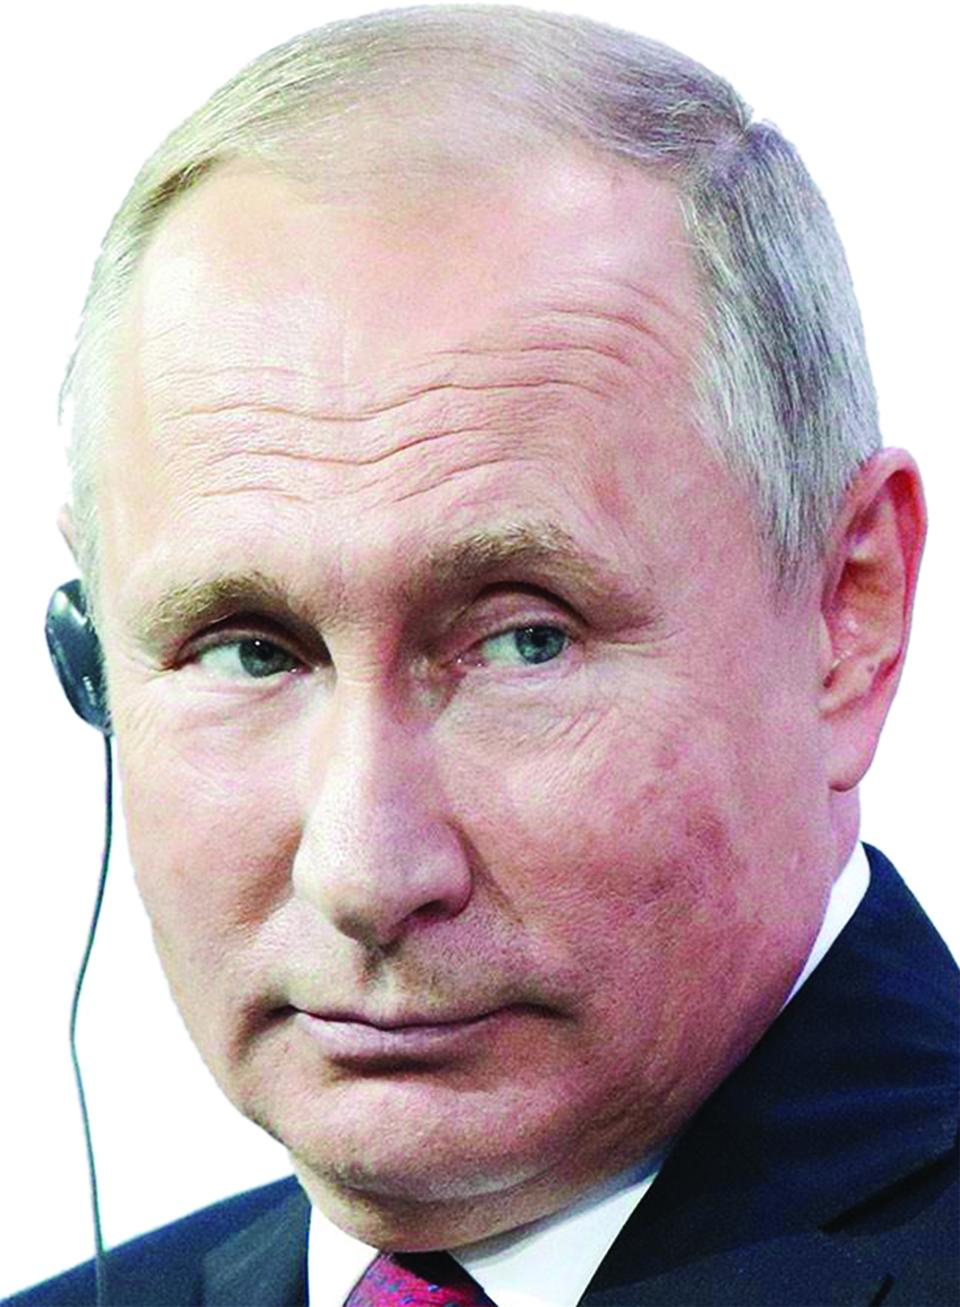 Putin's declining popularity